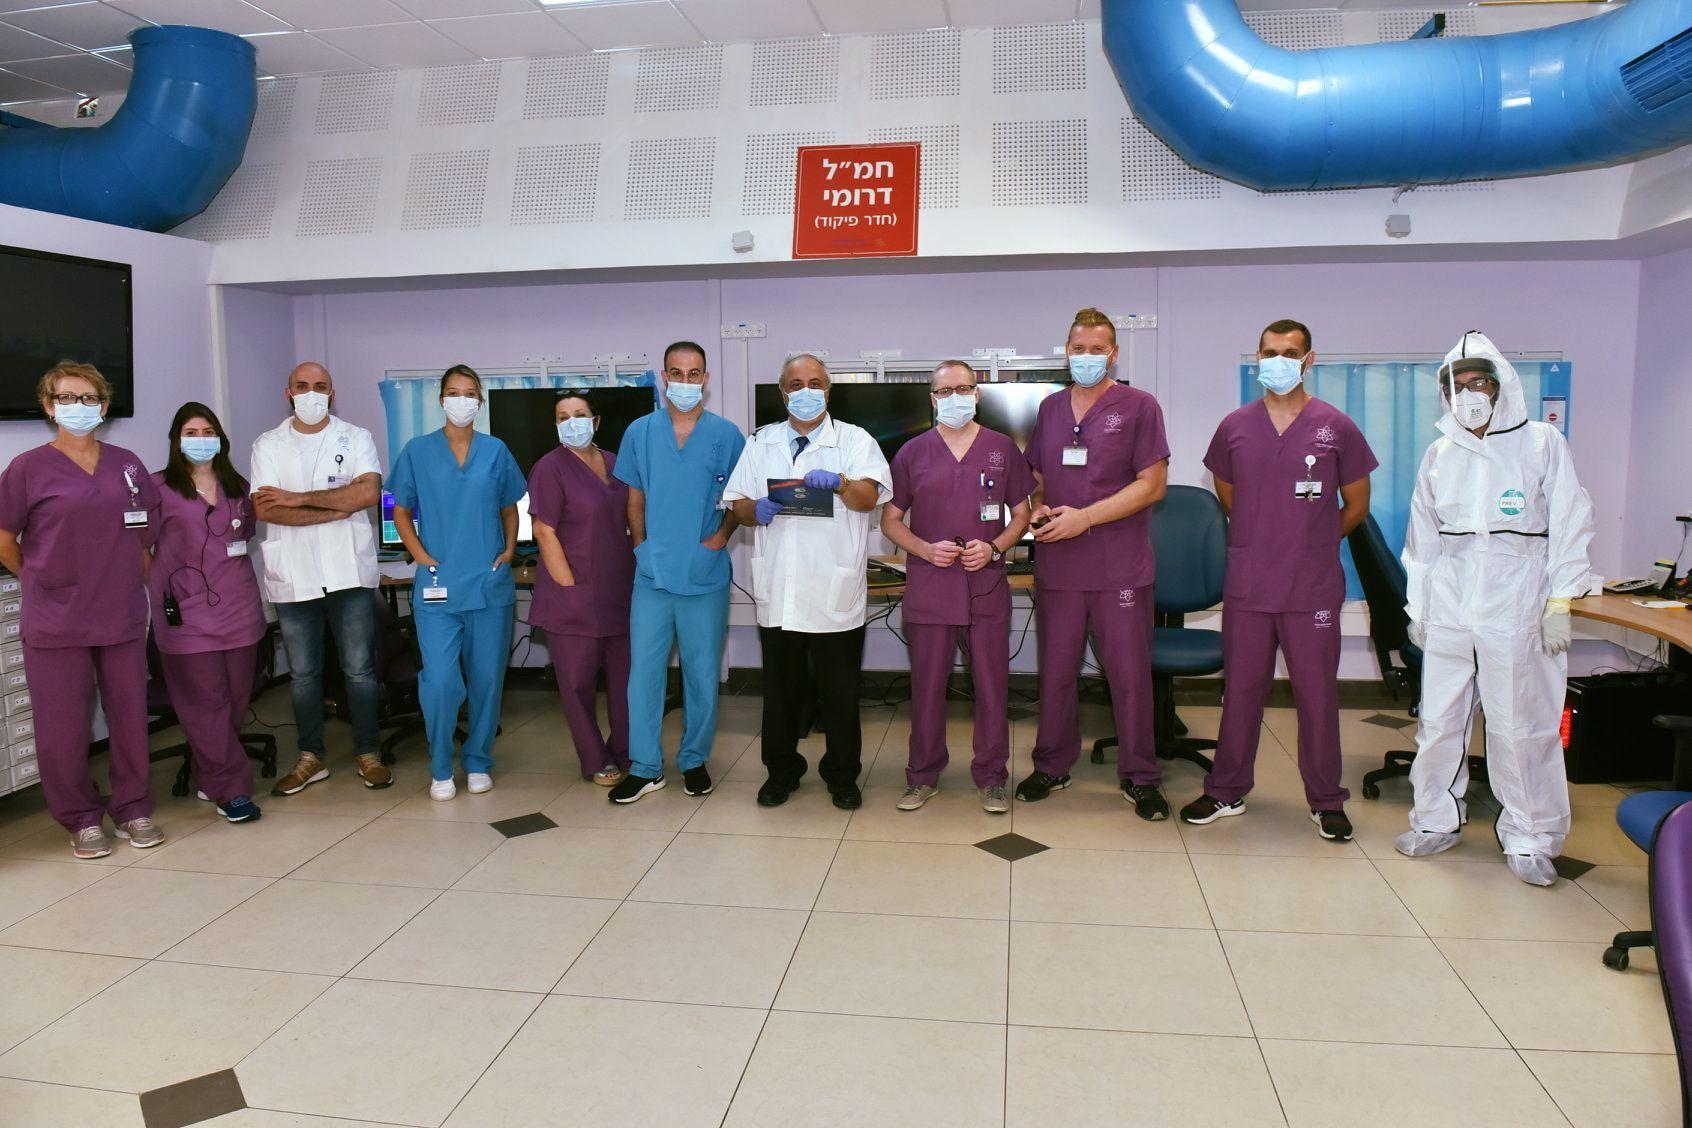 Galilee Medical Center reopens its second Coronavirus ward